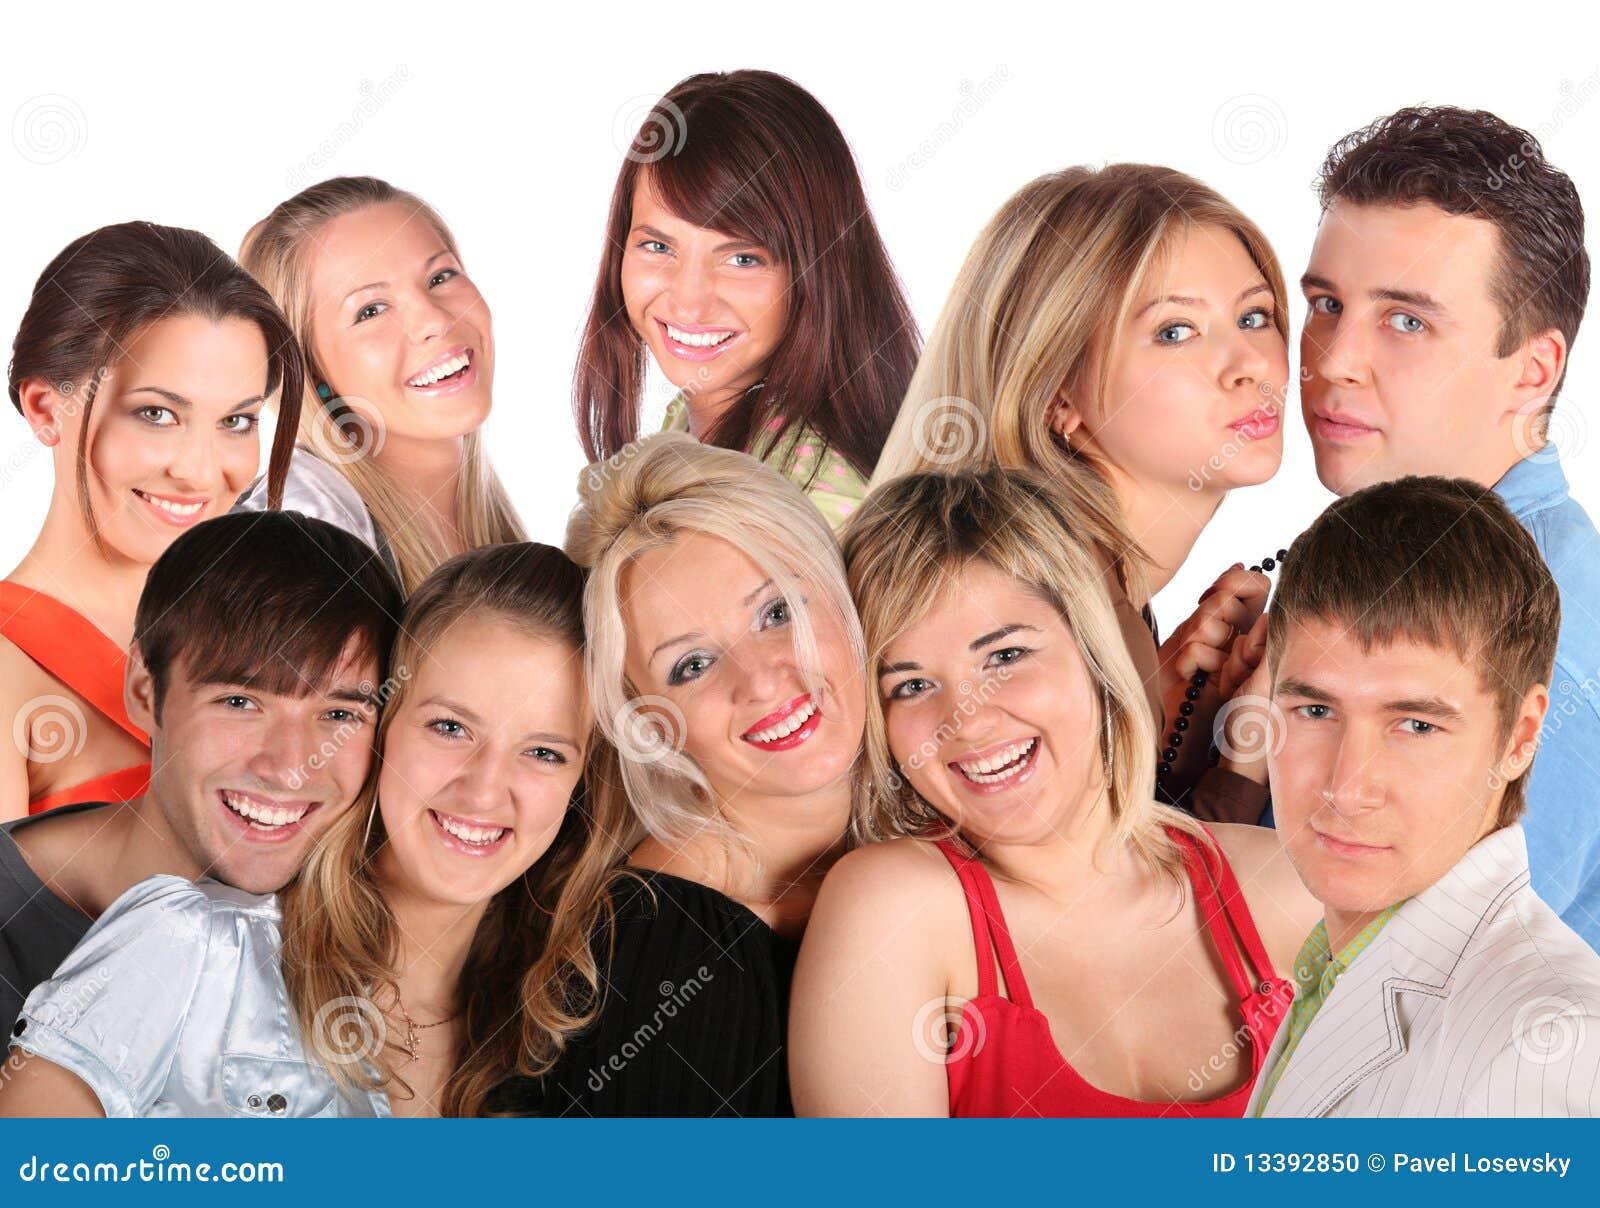 Vele gezichten jonge mensen, collage